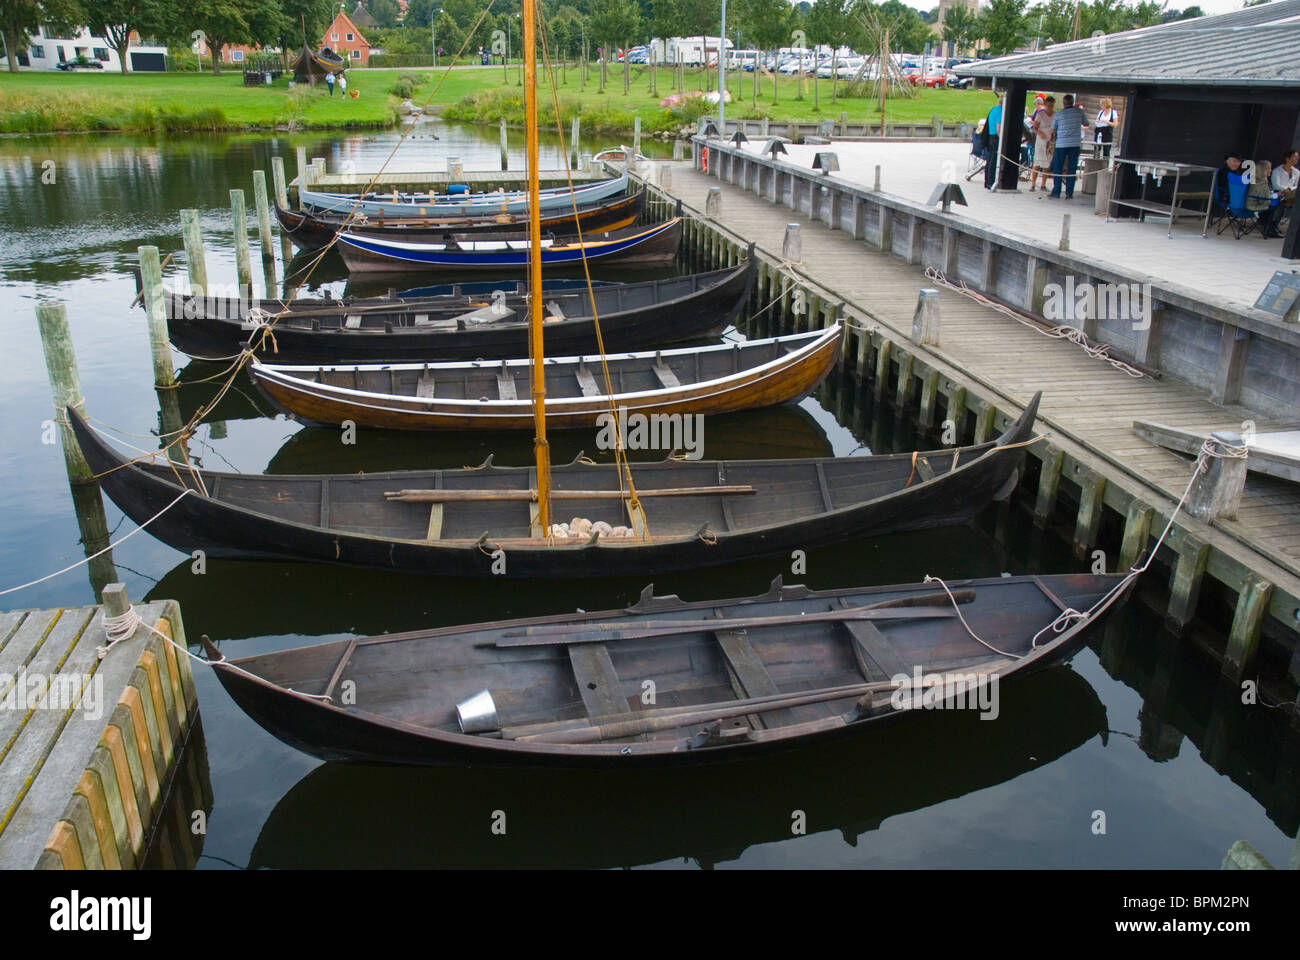 Viking ear replica boats at the harbour of Roskilde Fjord lake Roskilde Denmark Europe Stock Photo